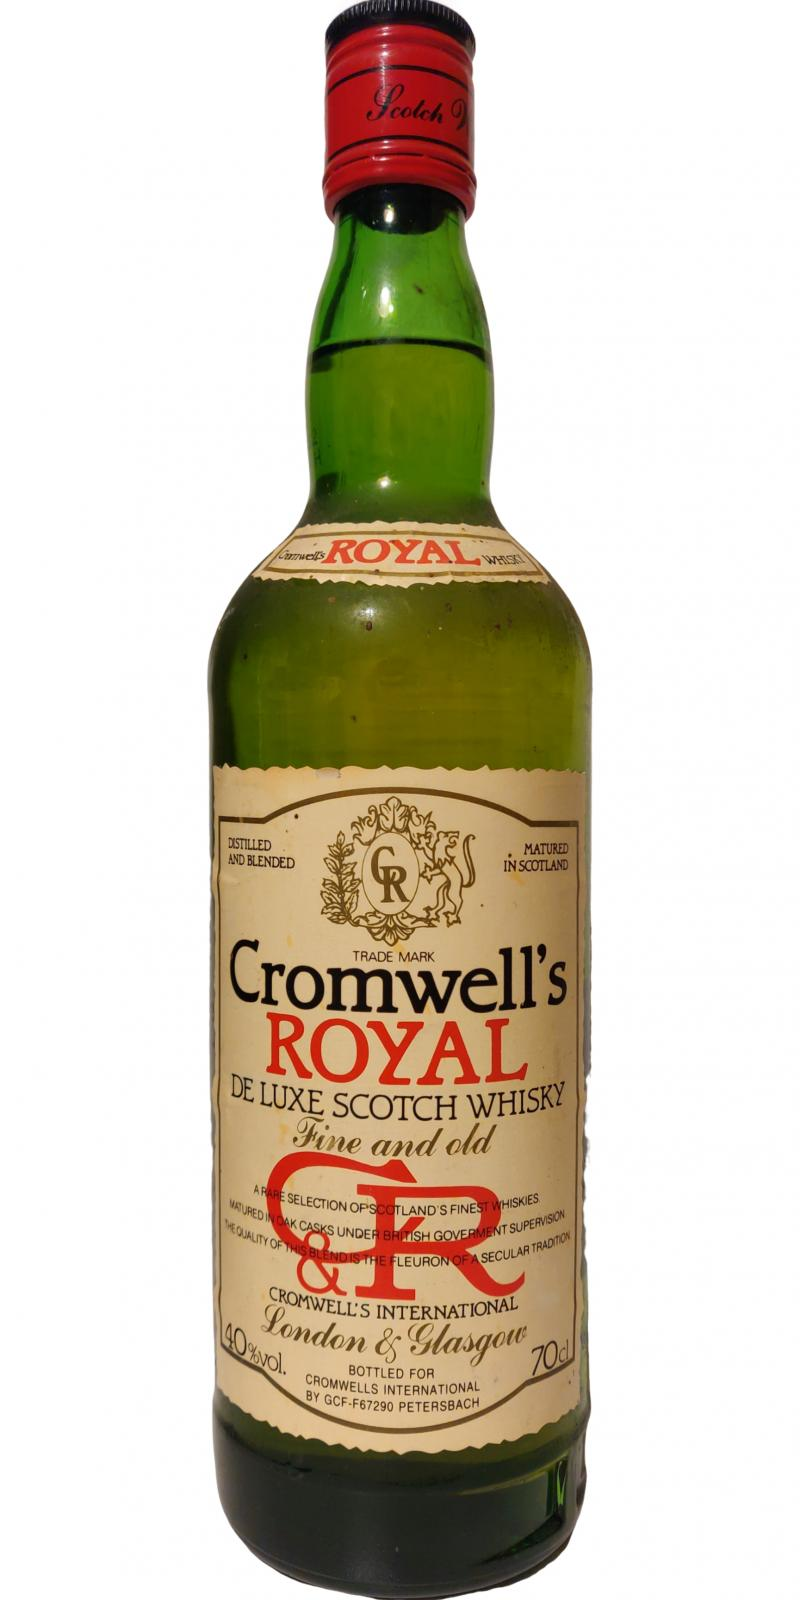 Cromwell's Royal